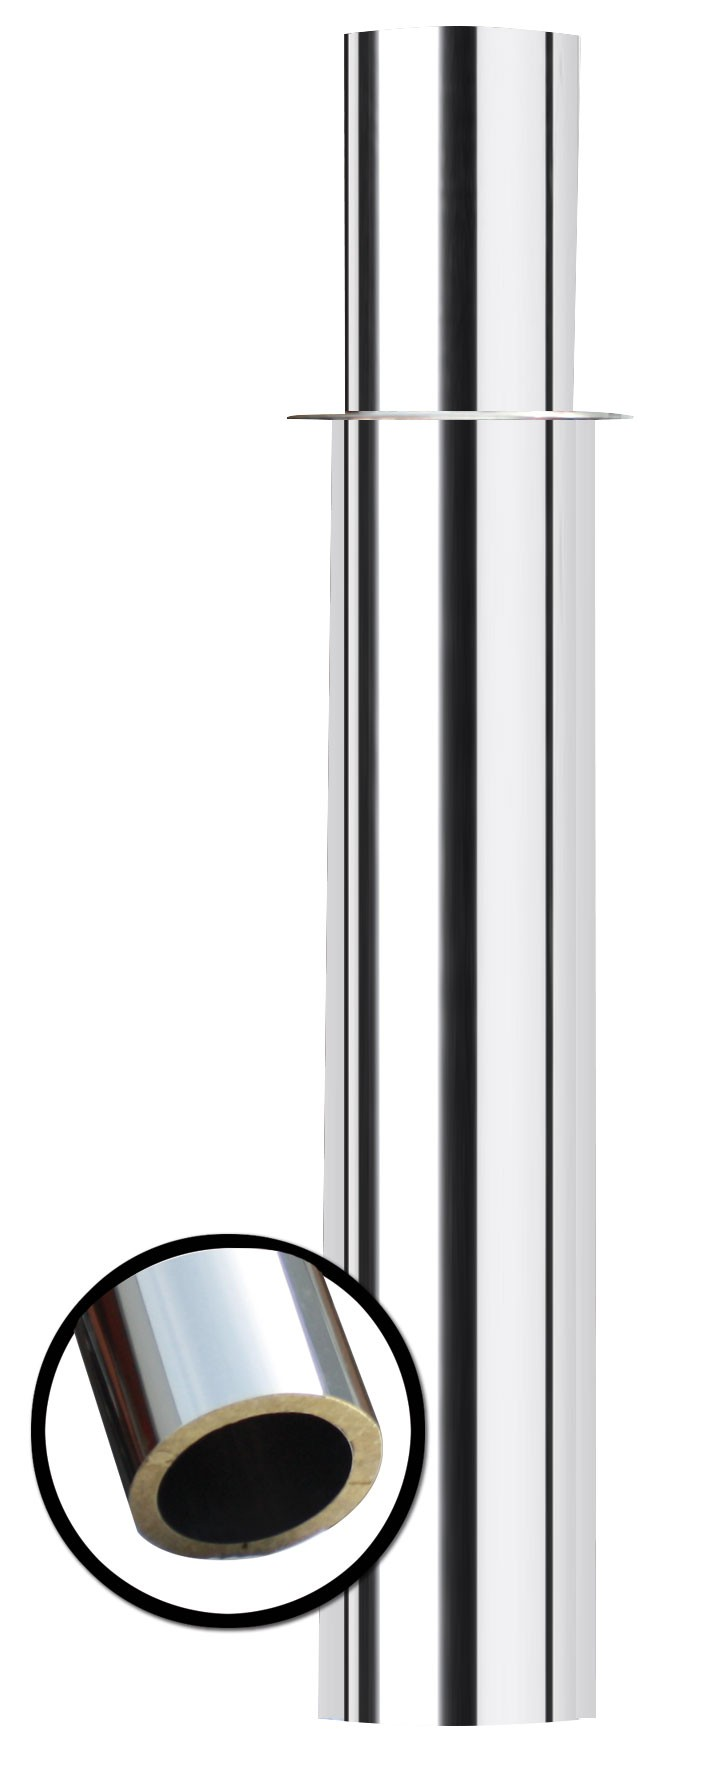 Verlängerungselement Edelstahl ohne Windkat 500 mm Ø 160 mm Bild 1